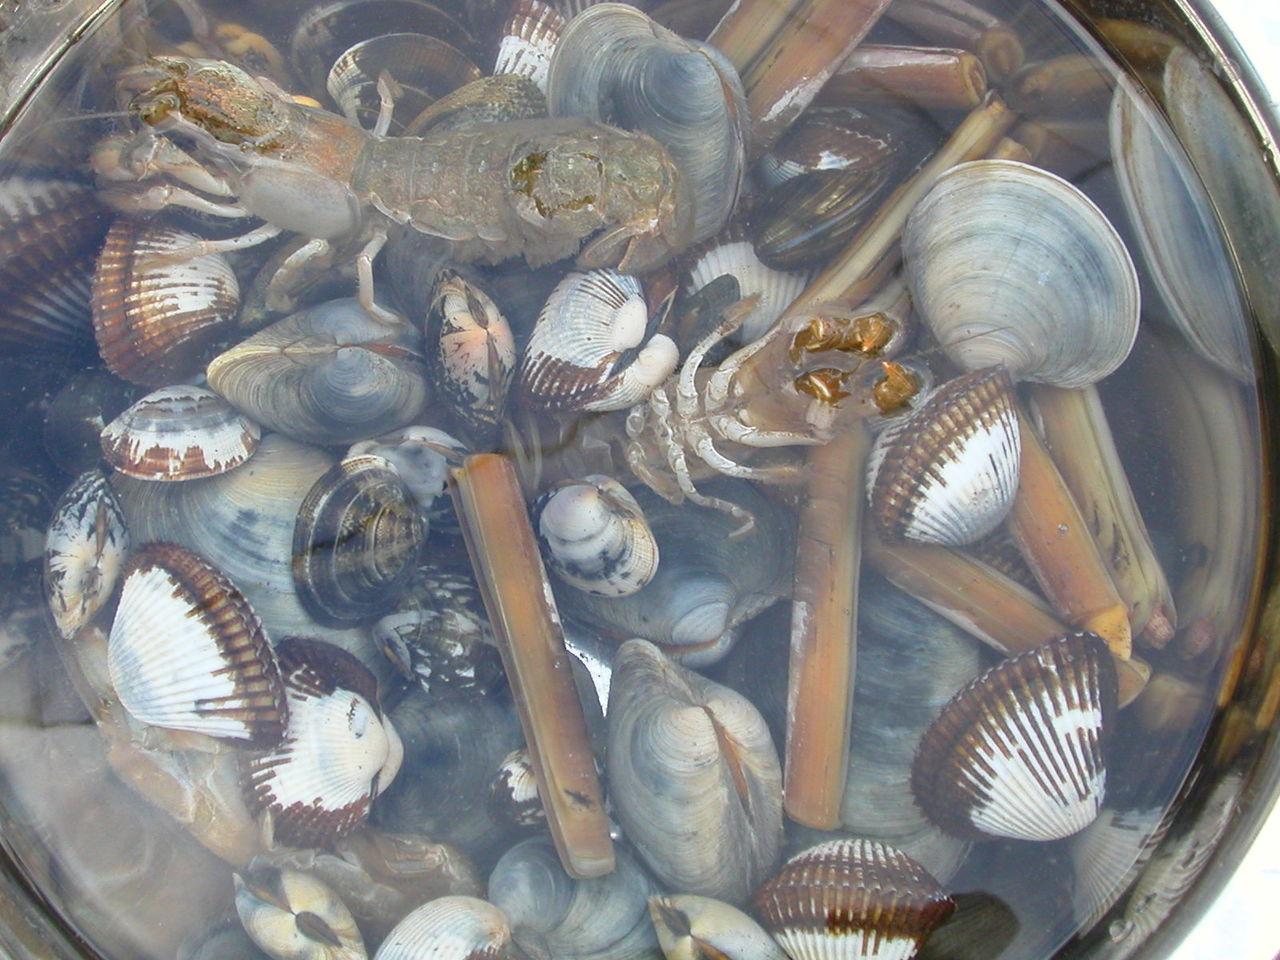 【悲報】浜名湖潮干狩り中止 2年連続、アサリ不漁